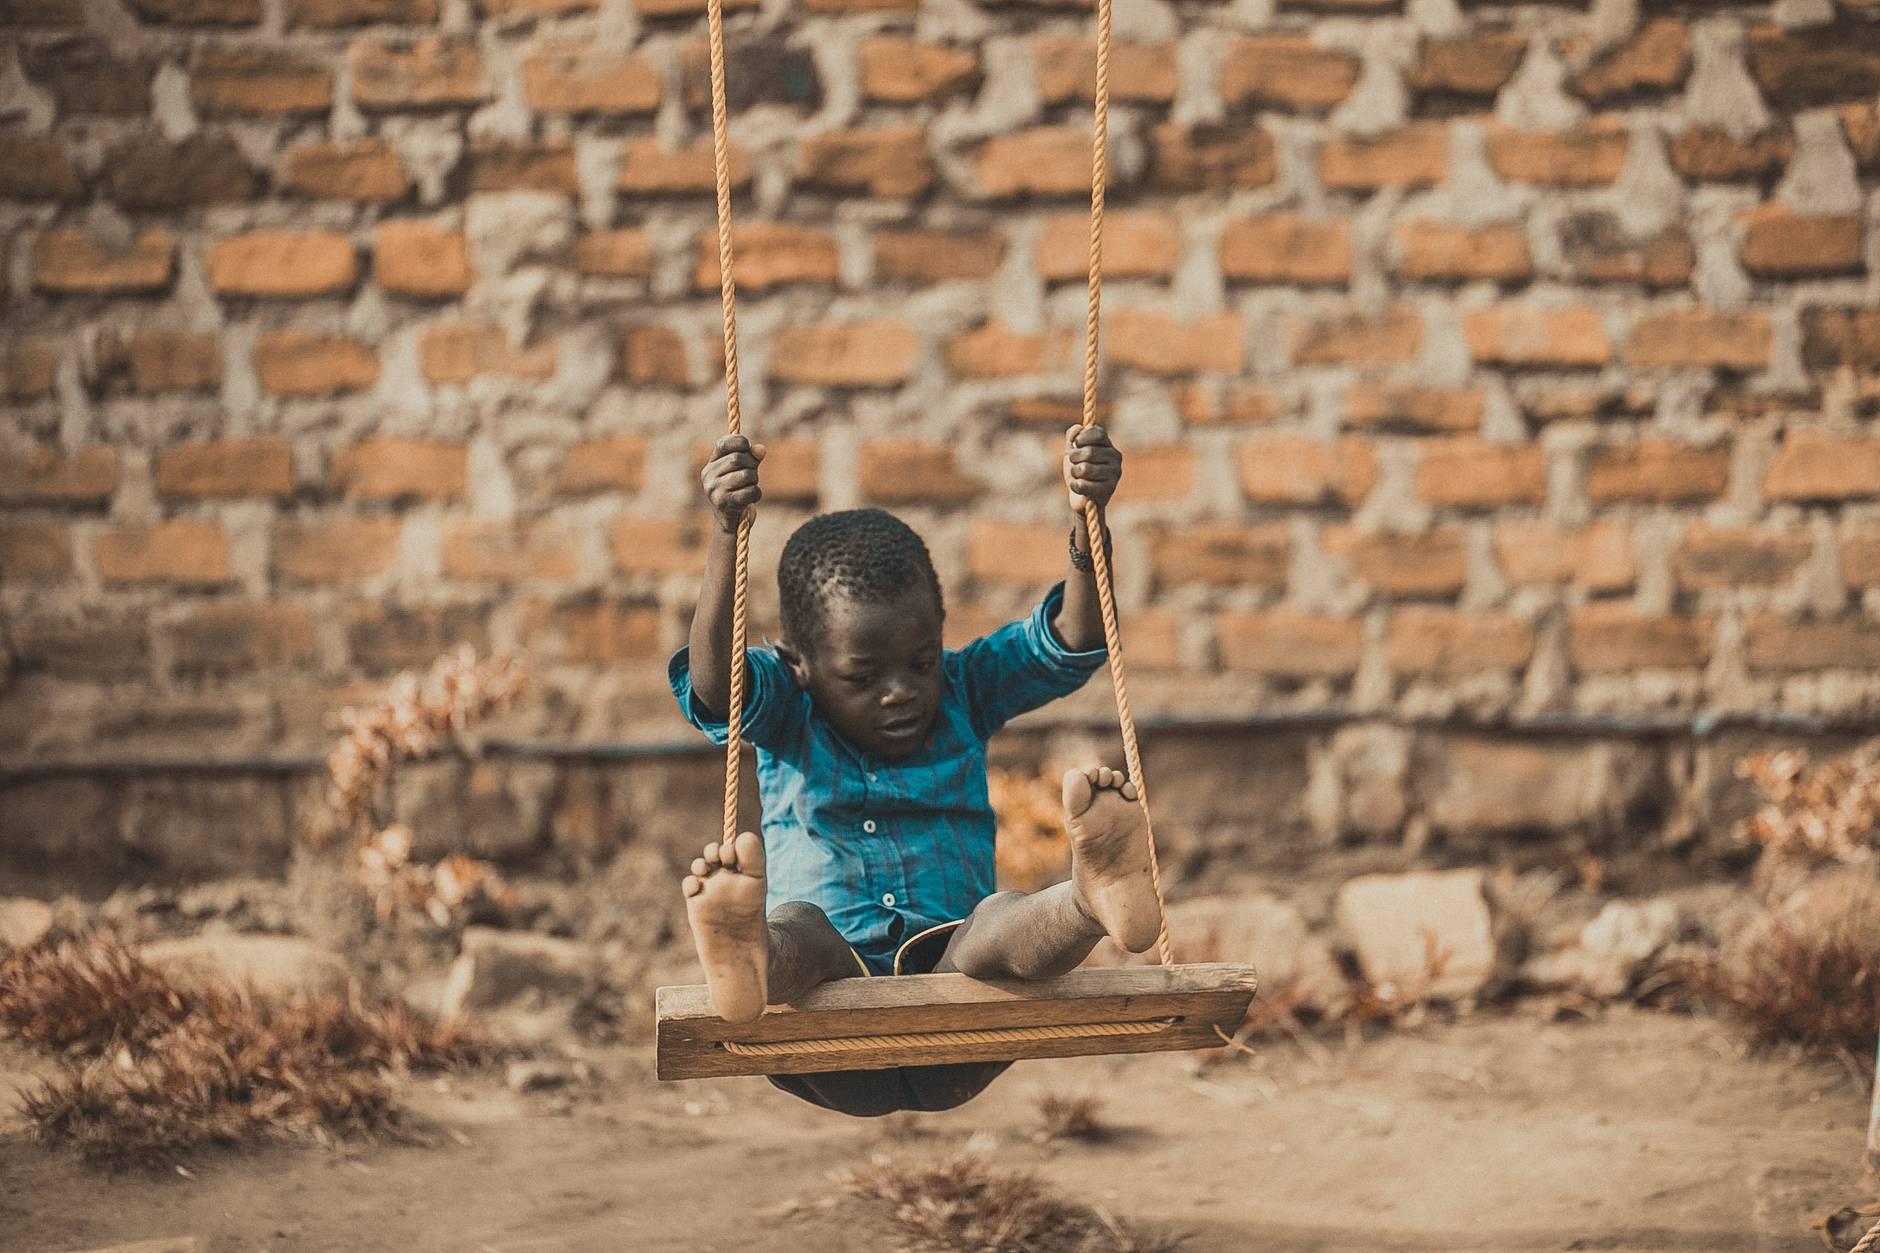 boy wearing blue shirt sitting on swing